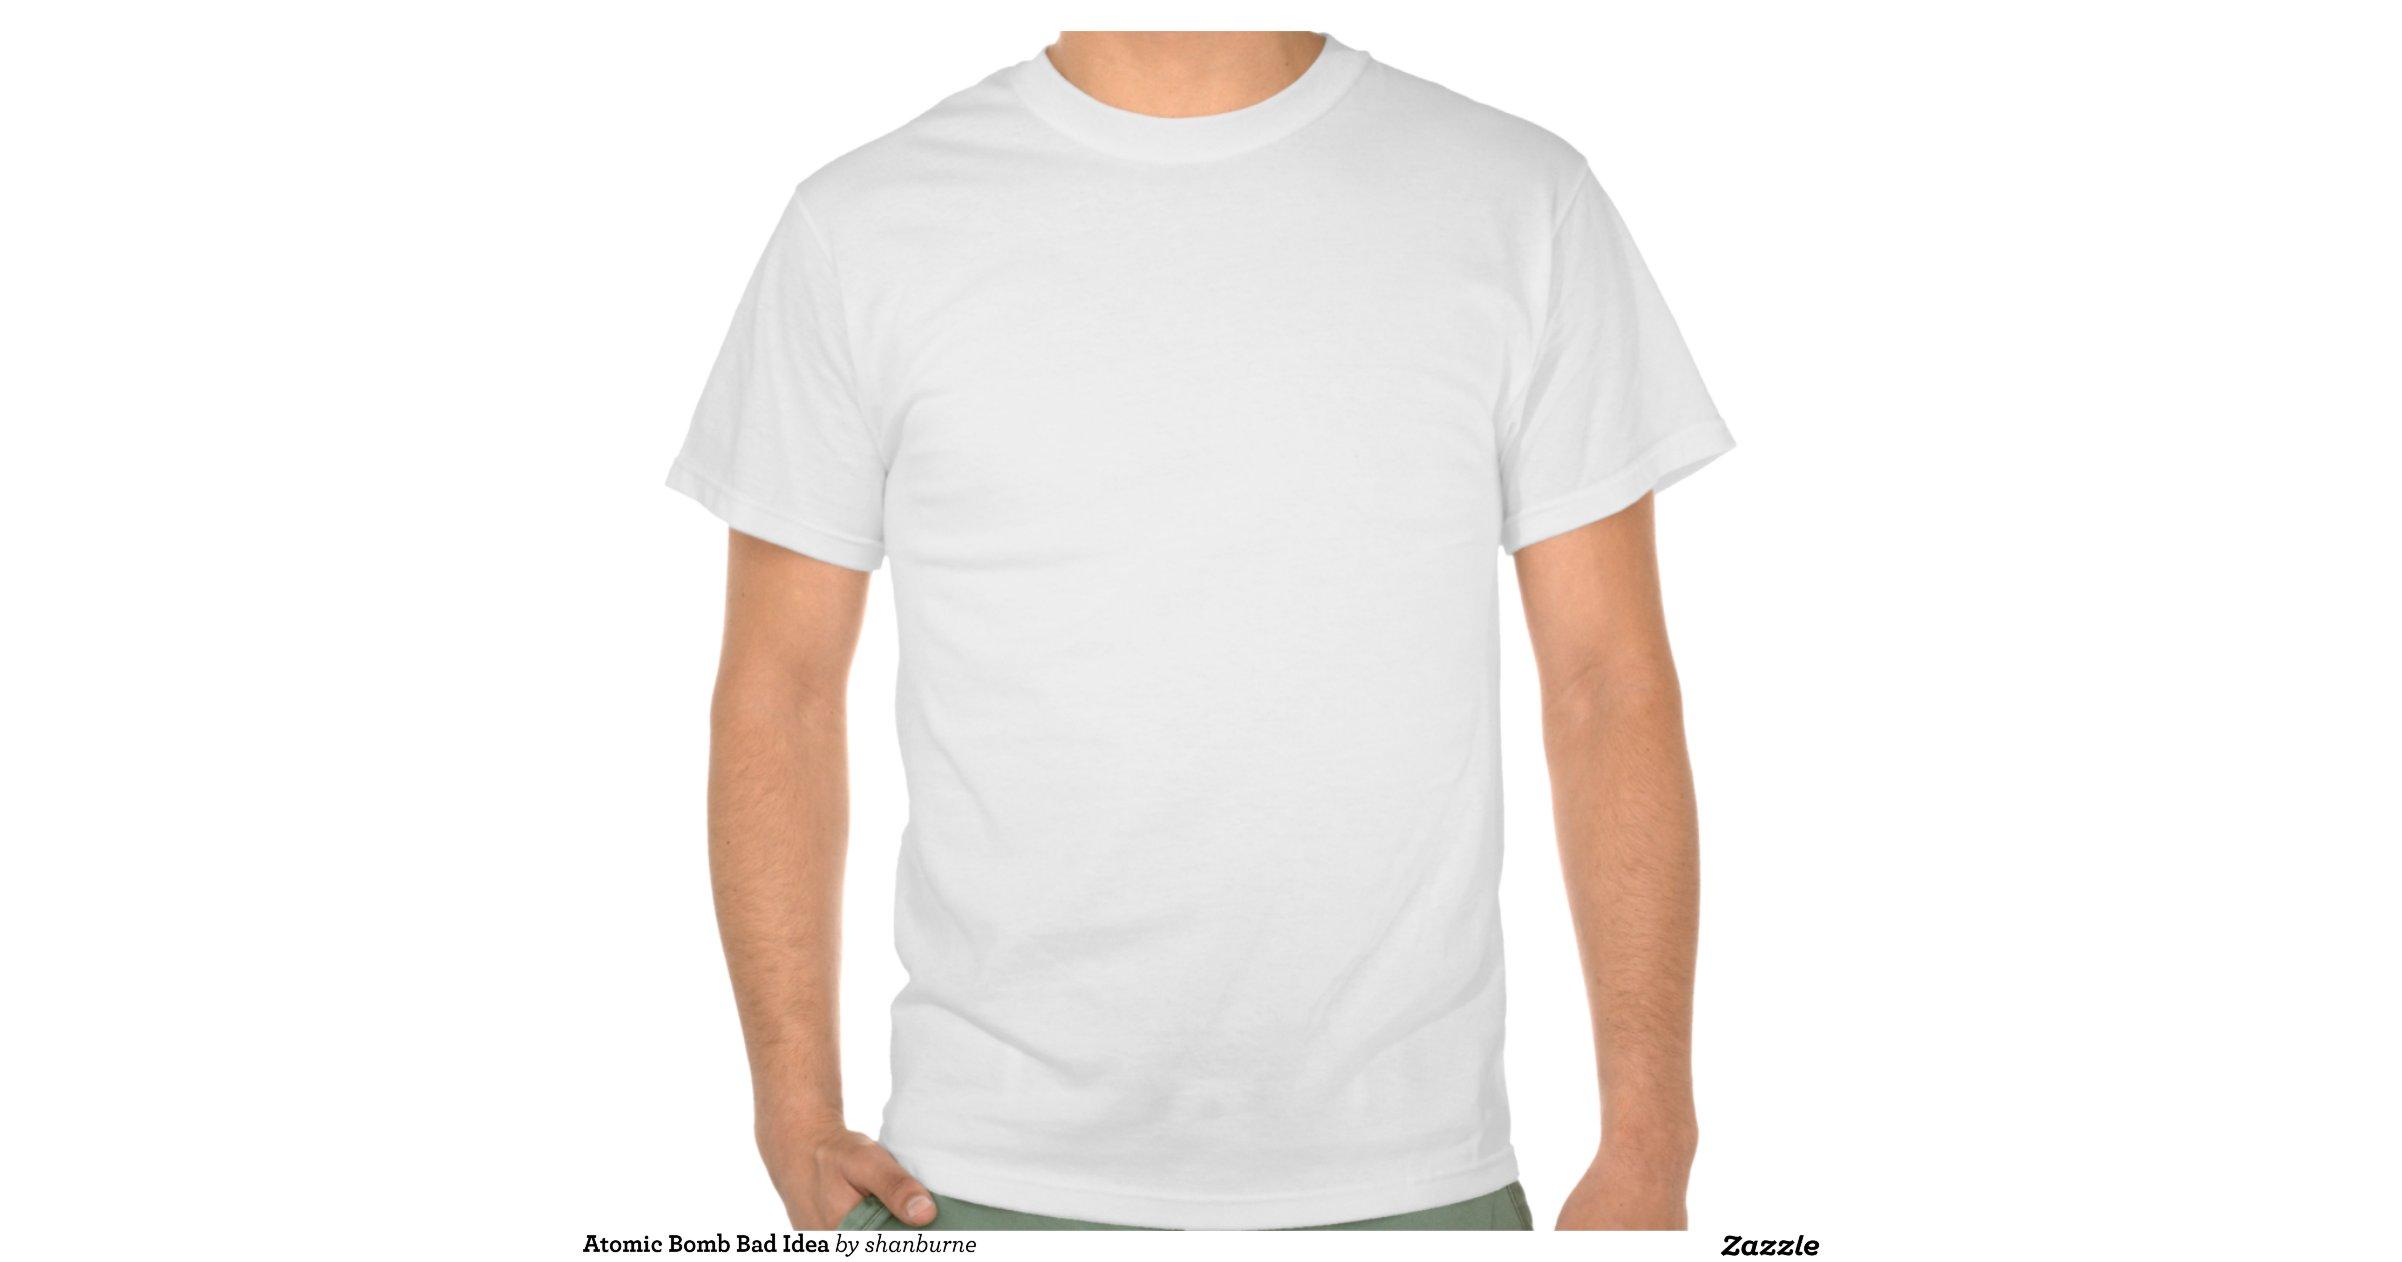 Atomic bomb bad idea t shirts rd8705b13bdef466fbd2026bf37f341d7 804gy